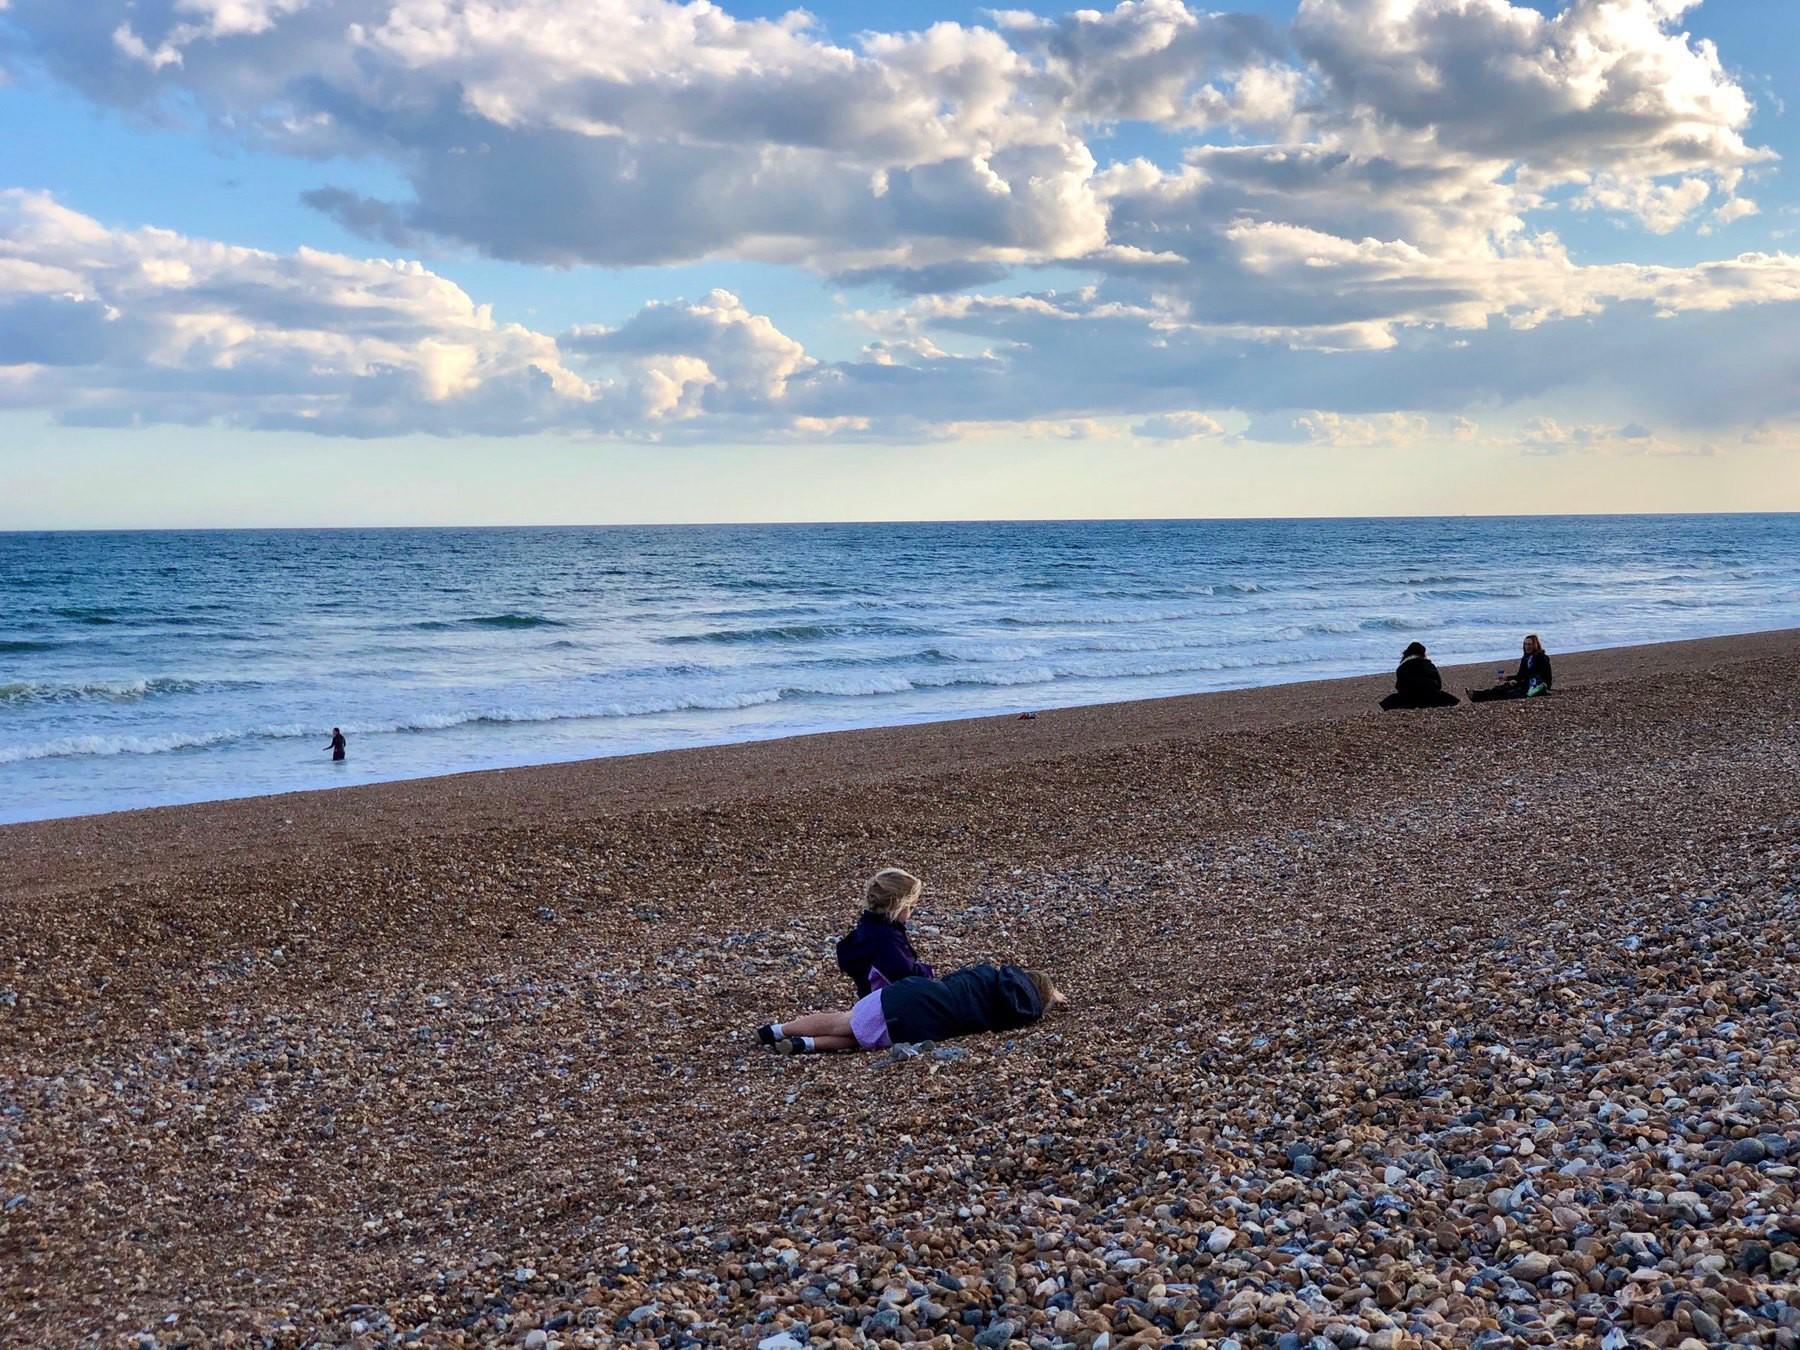 A few people enjoying Shoreham Beach in the evening.